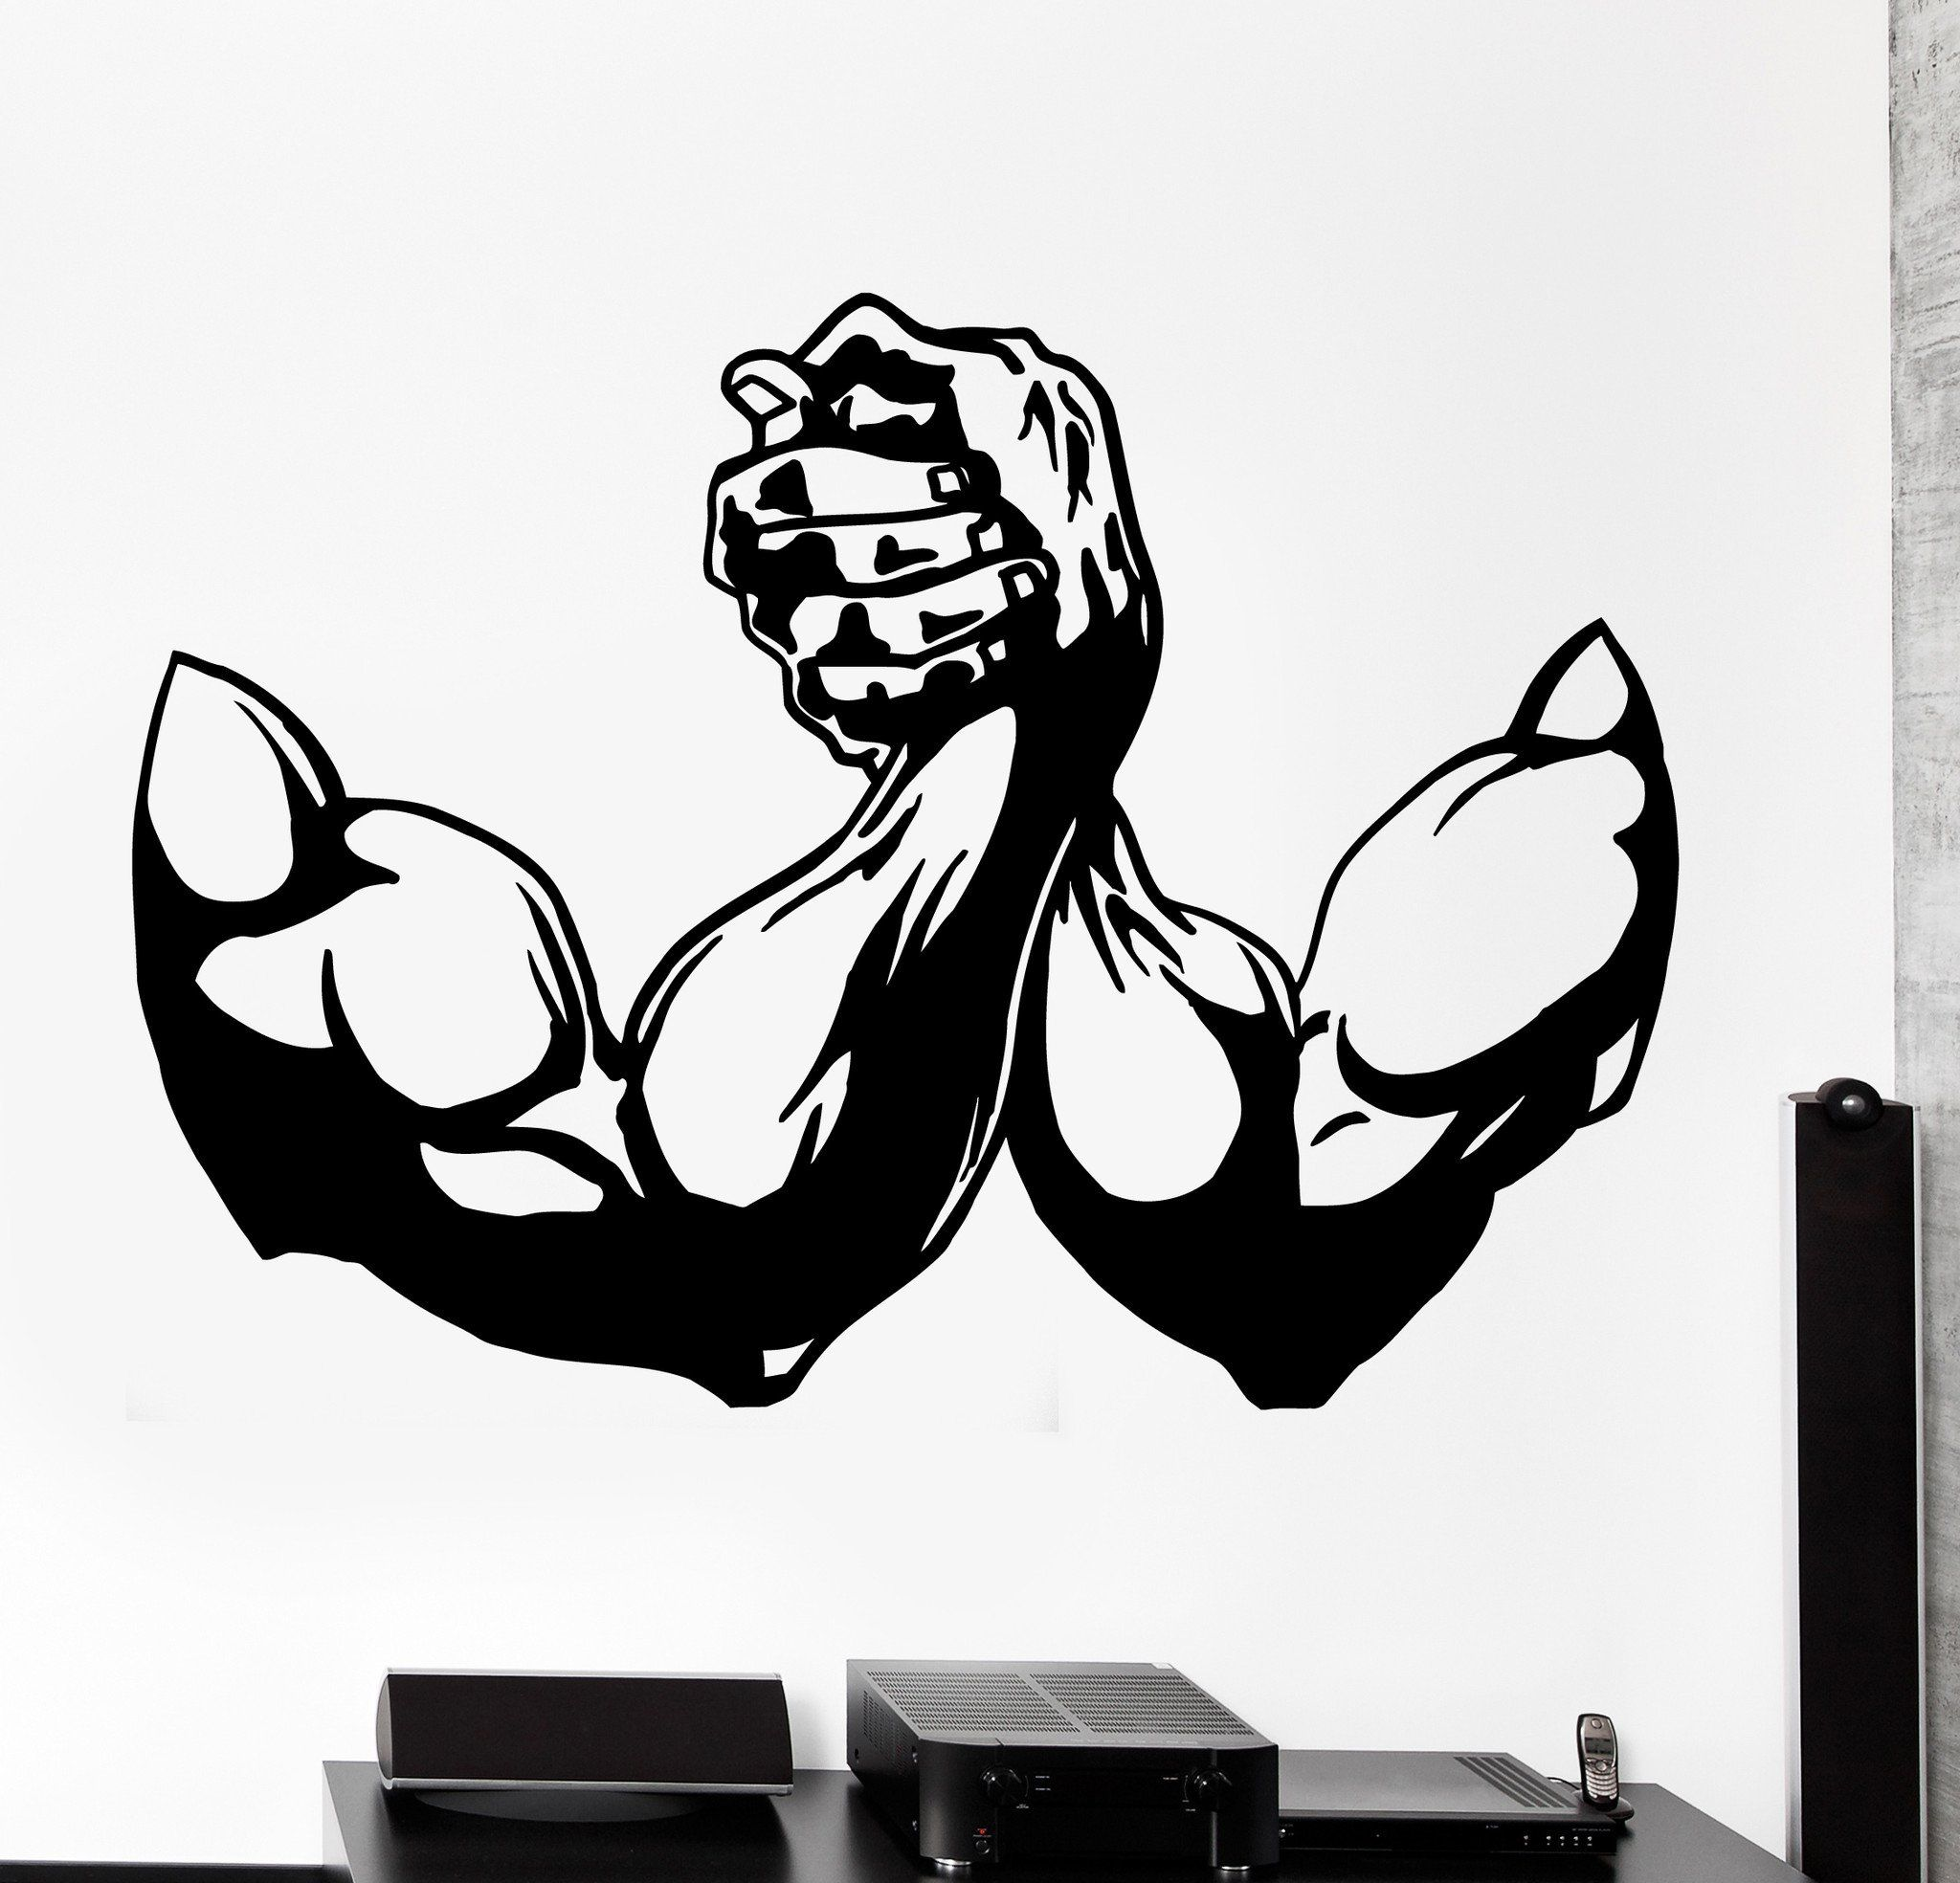 Wall Vinyl Decal Arm Wrestling Sport Bodybuilding Home